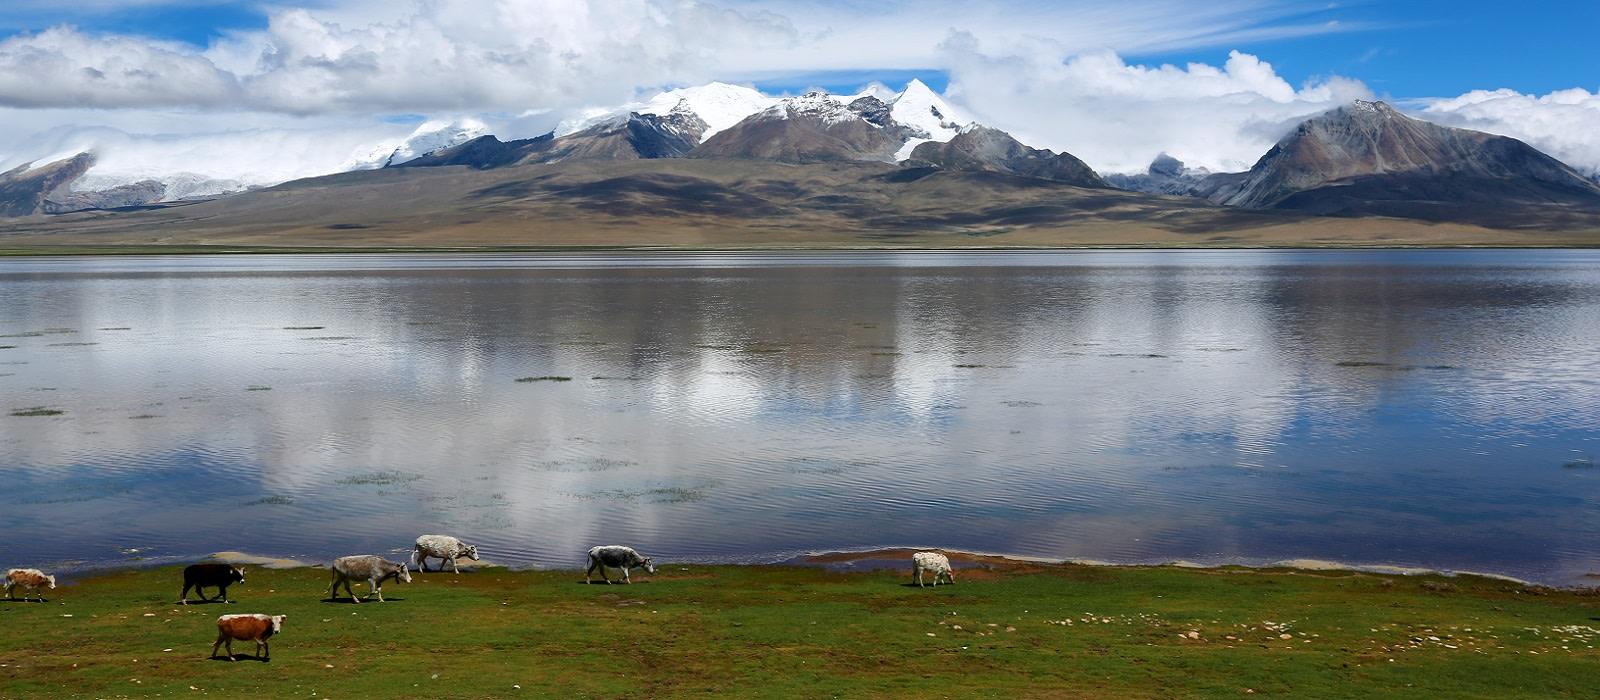 Reiseziel Gyantse Tibet